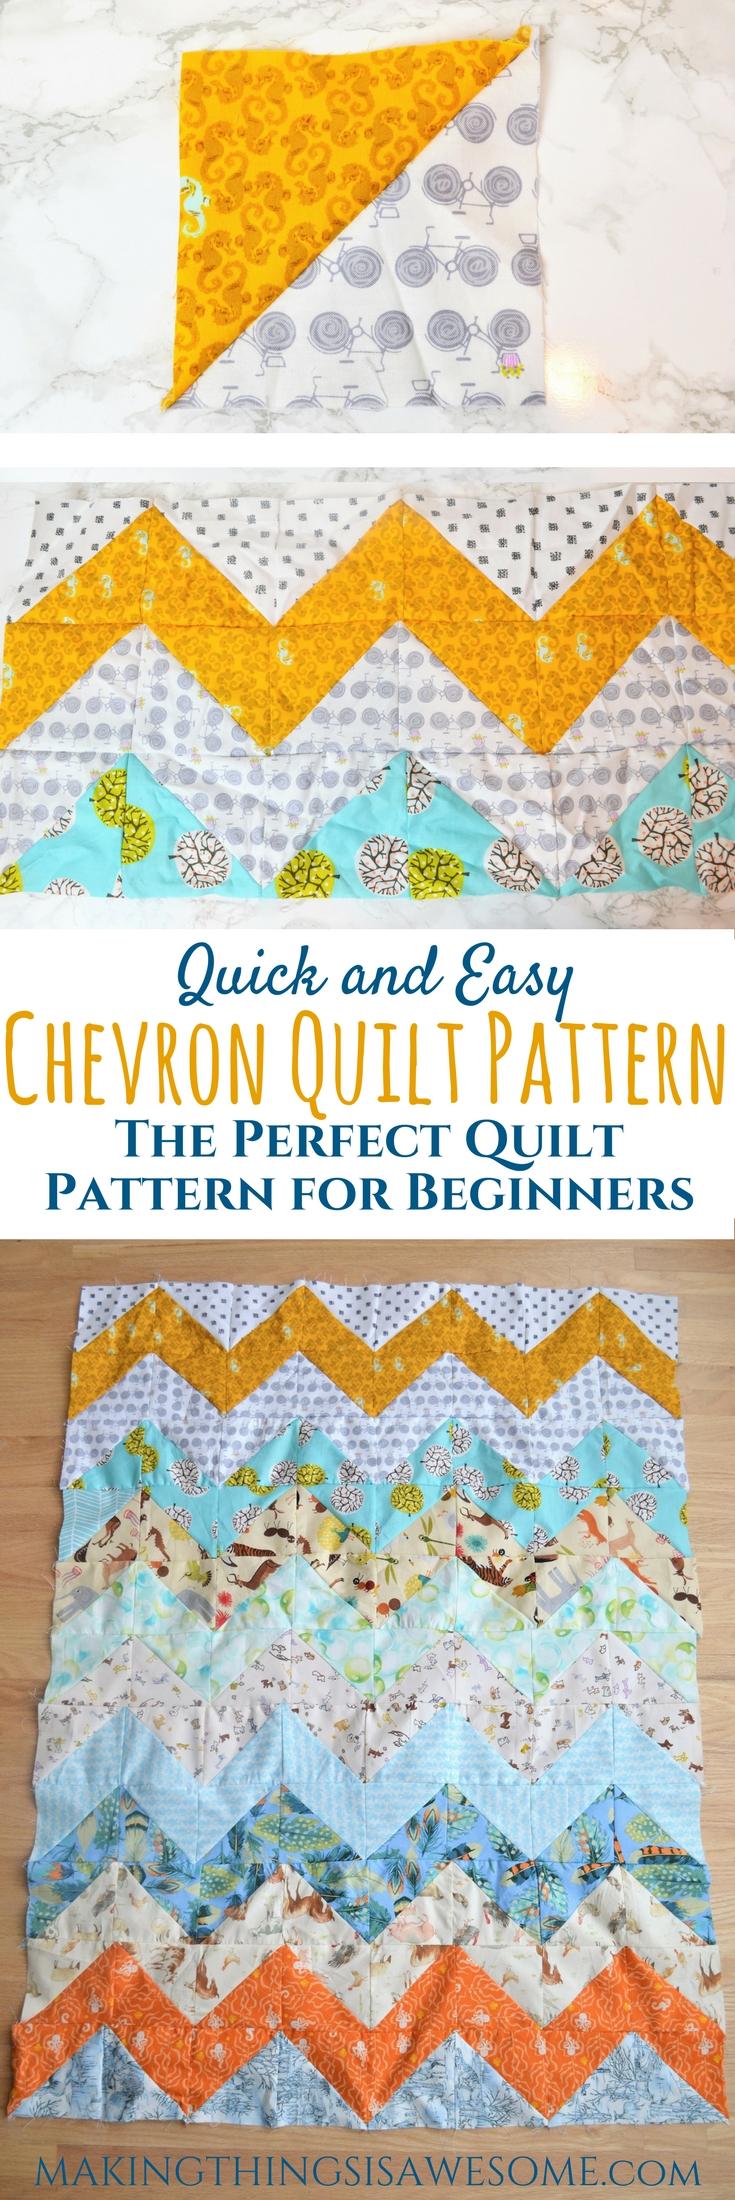 Chevron Quilt Pattern for beginners